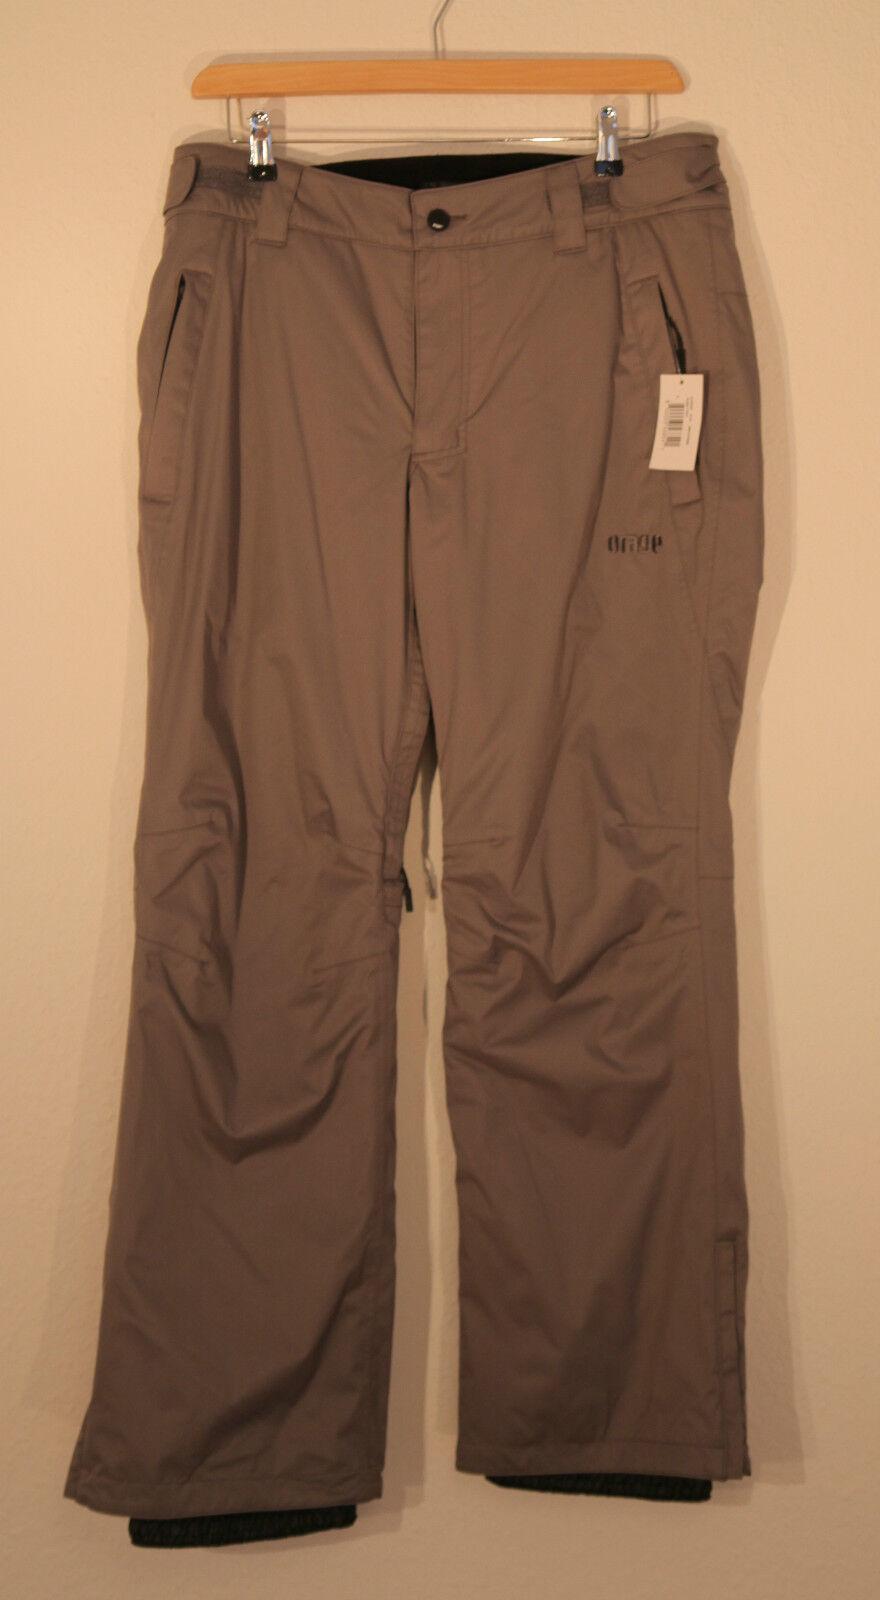 NUOVO Orage Men Uomo Freestyle sci FREESKI pantaloni Pant Yorkton Quest DARK grigio L